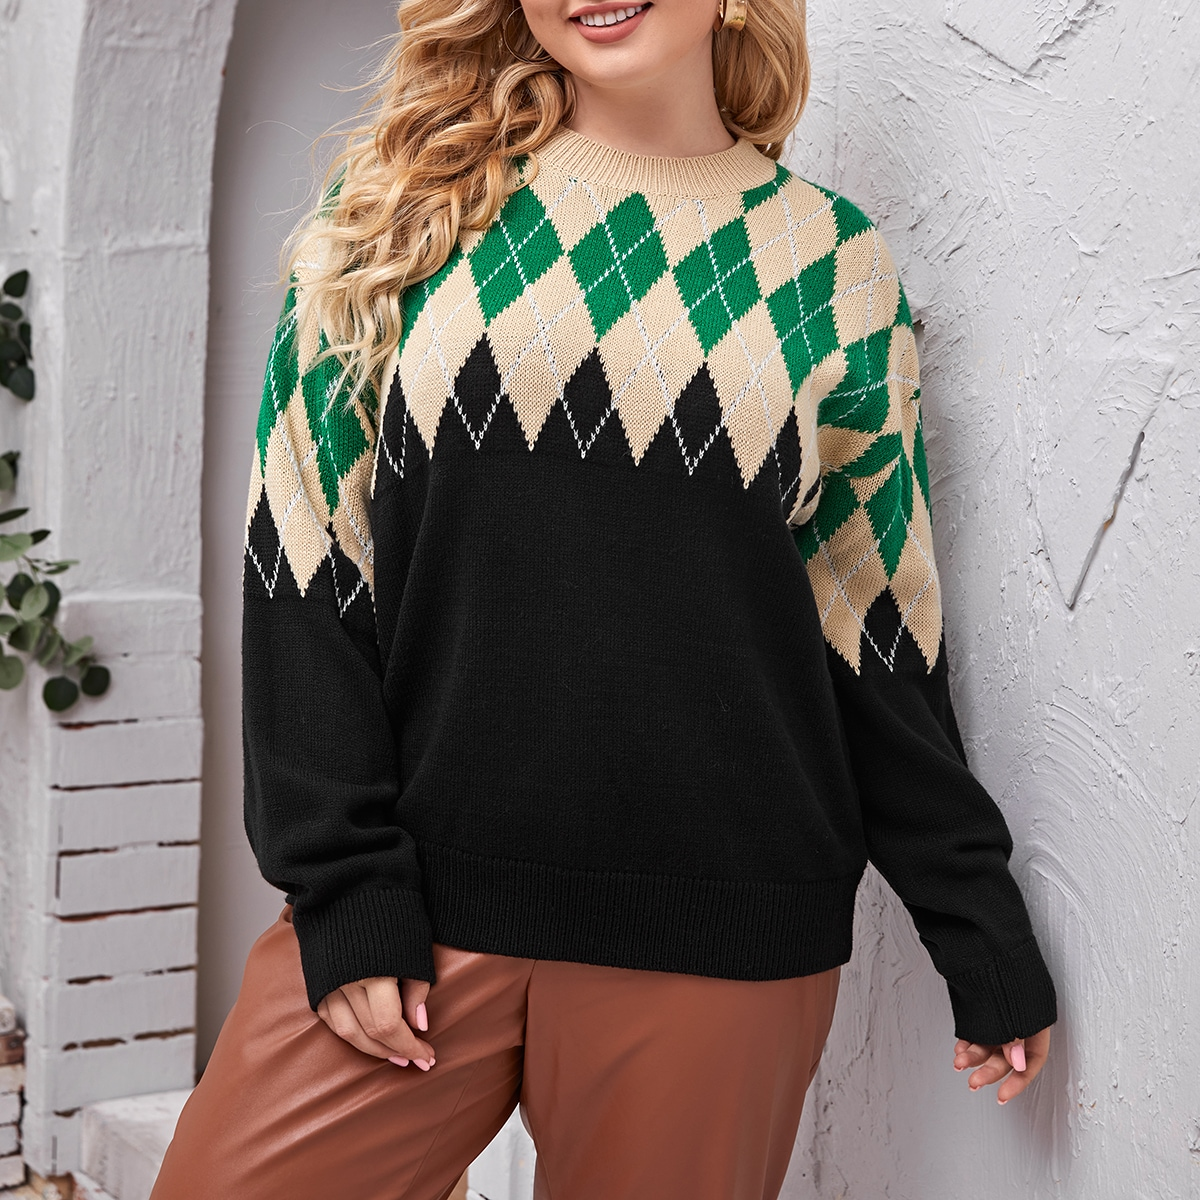 SHEIN Casual Geometrisch Grote maat: trui